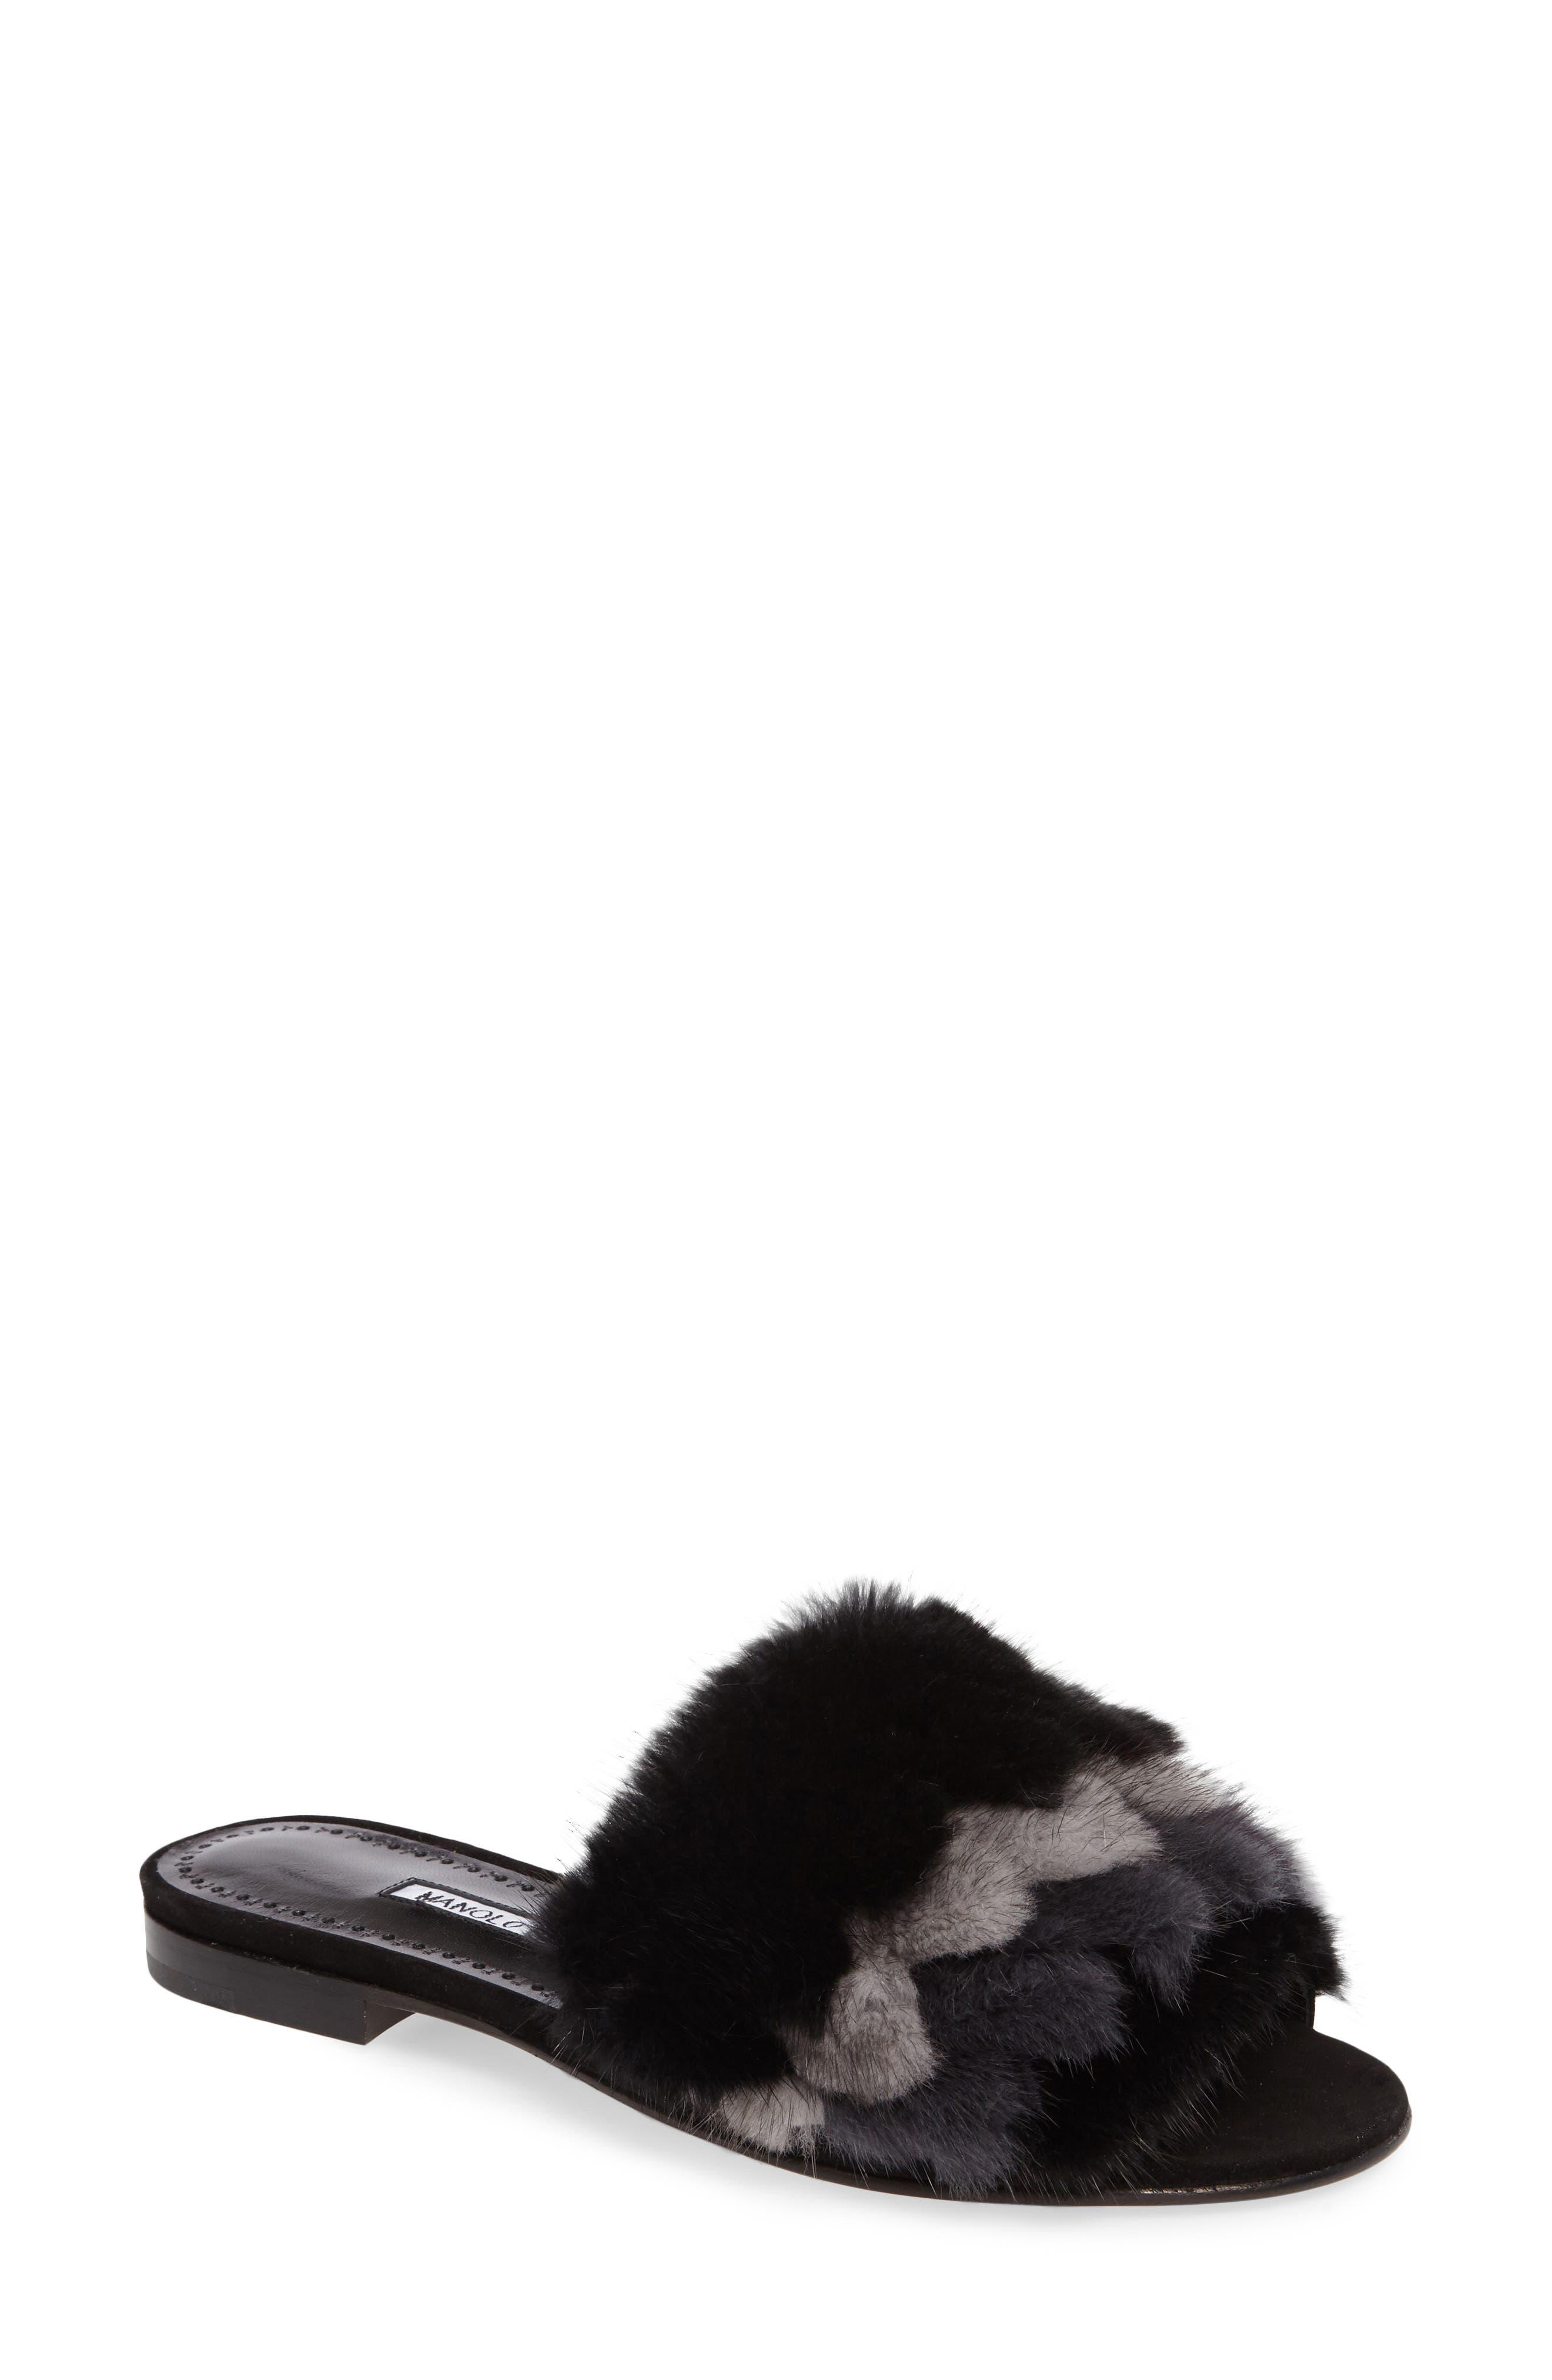 Main Image - Manolo Blahnik Pelosusmin Genuine Mink Fur Slide Sandal (Women)